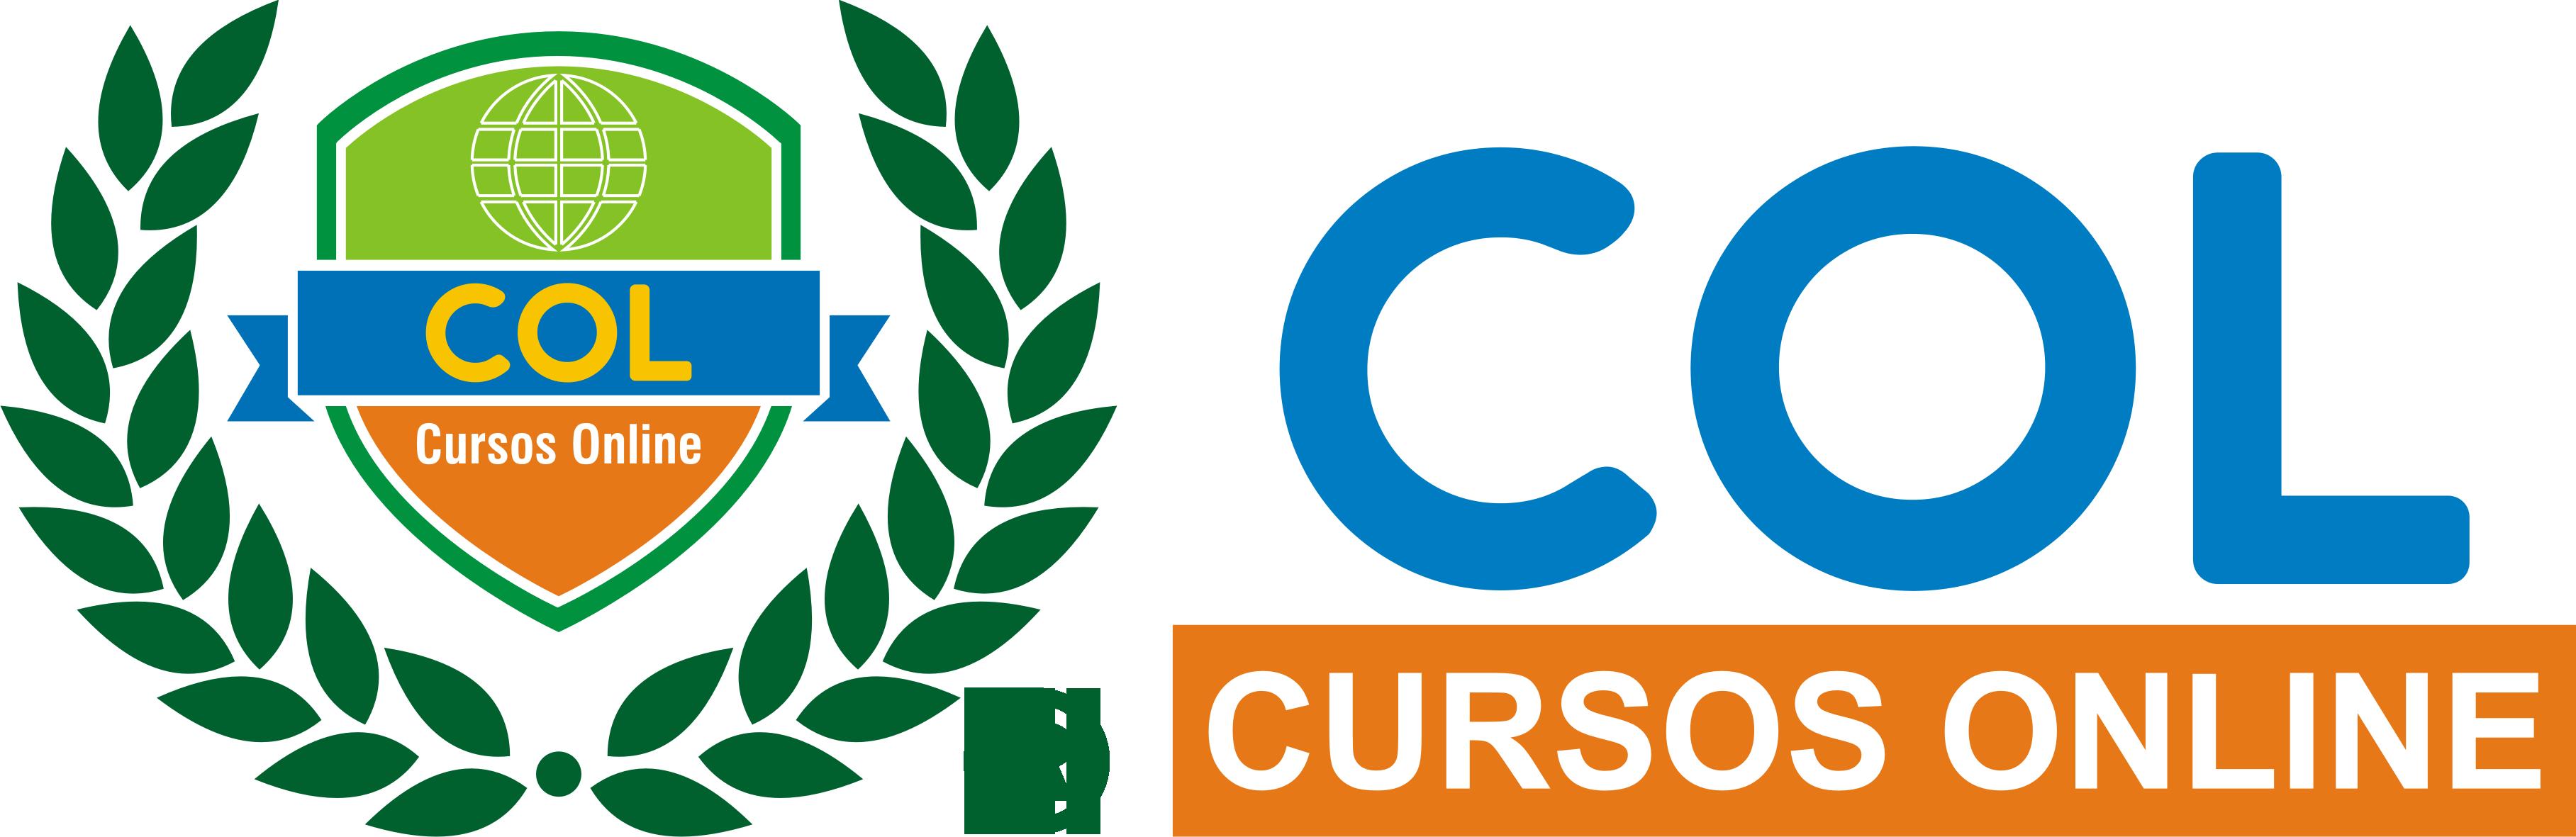 Blog COL Cursos Online